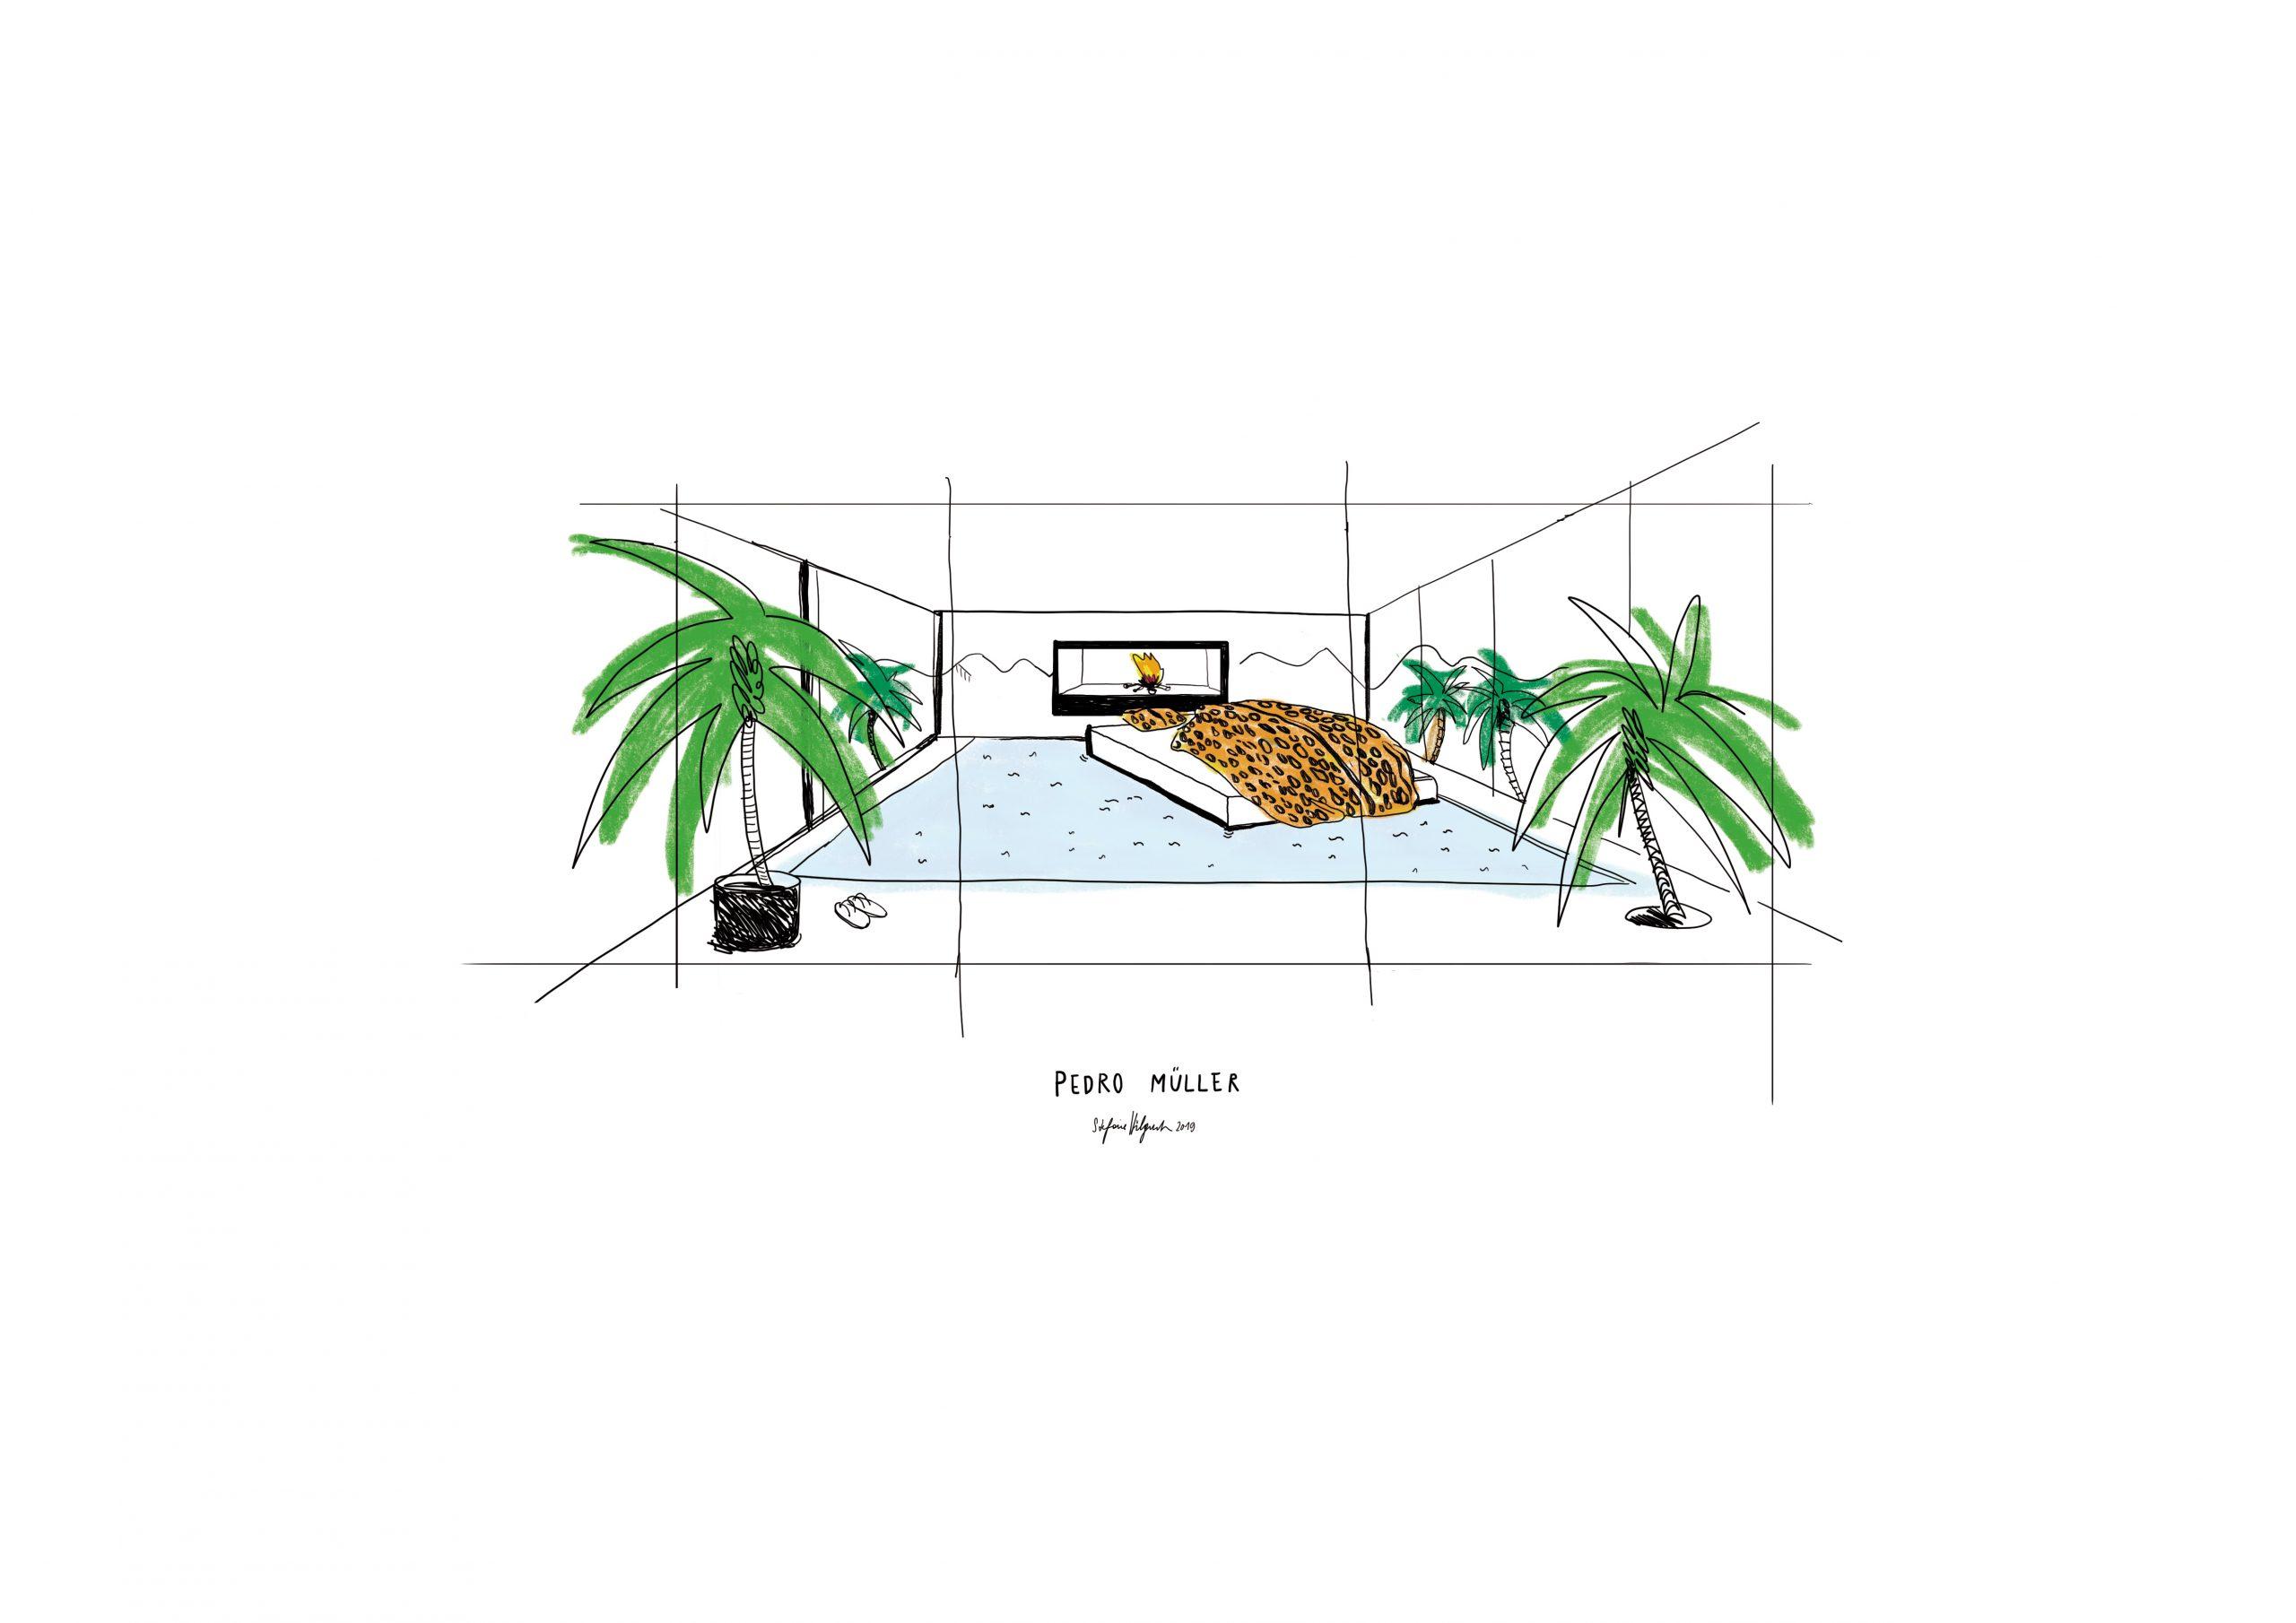 04_Wunschhaus_SMC_PM_Illustration_01-scaled